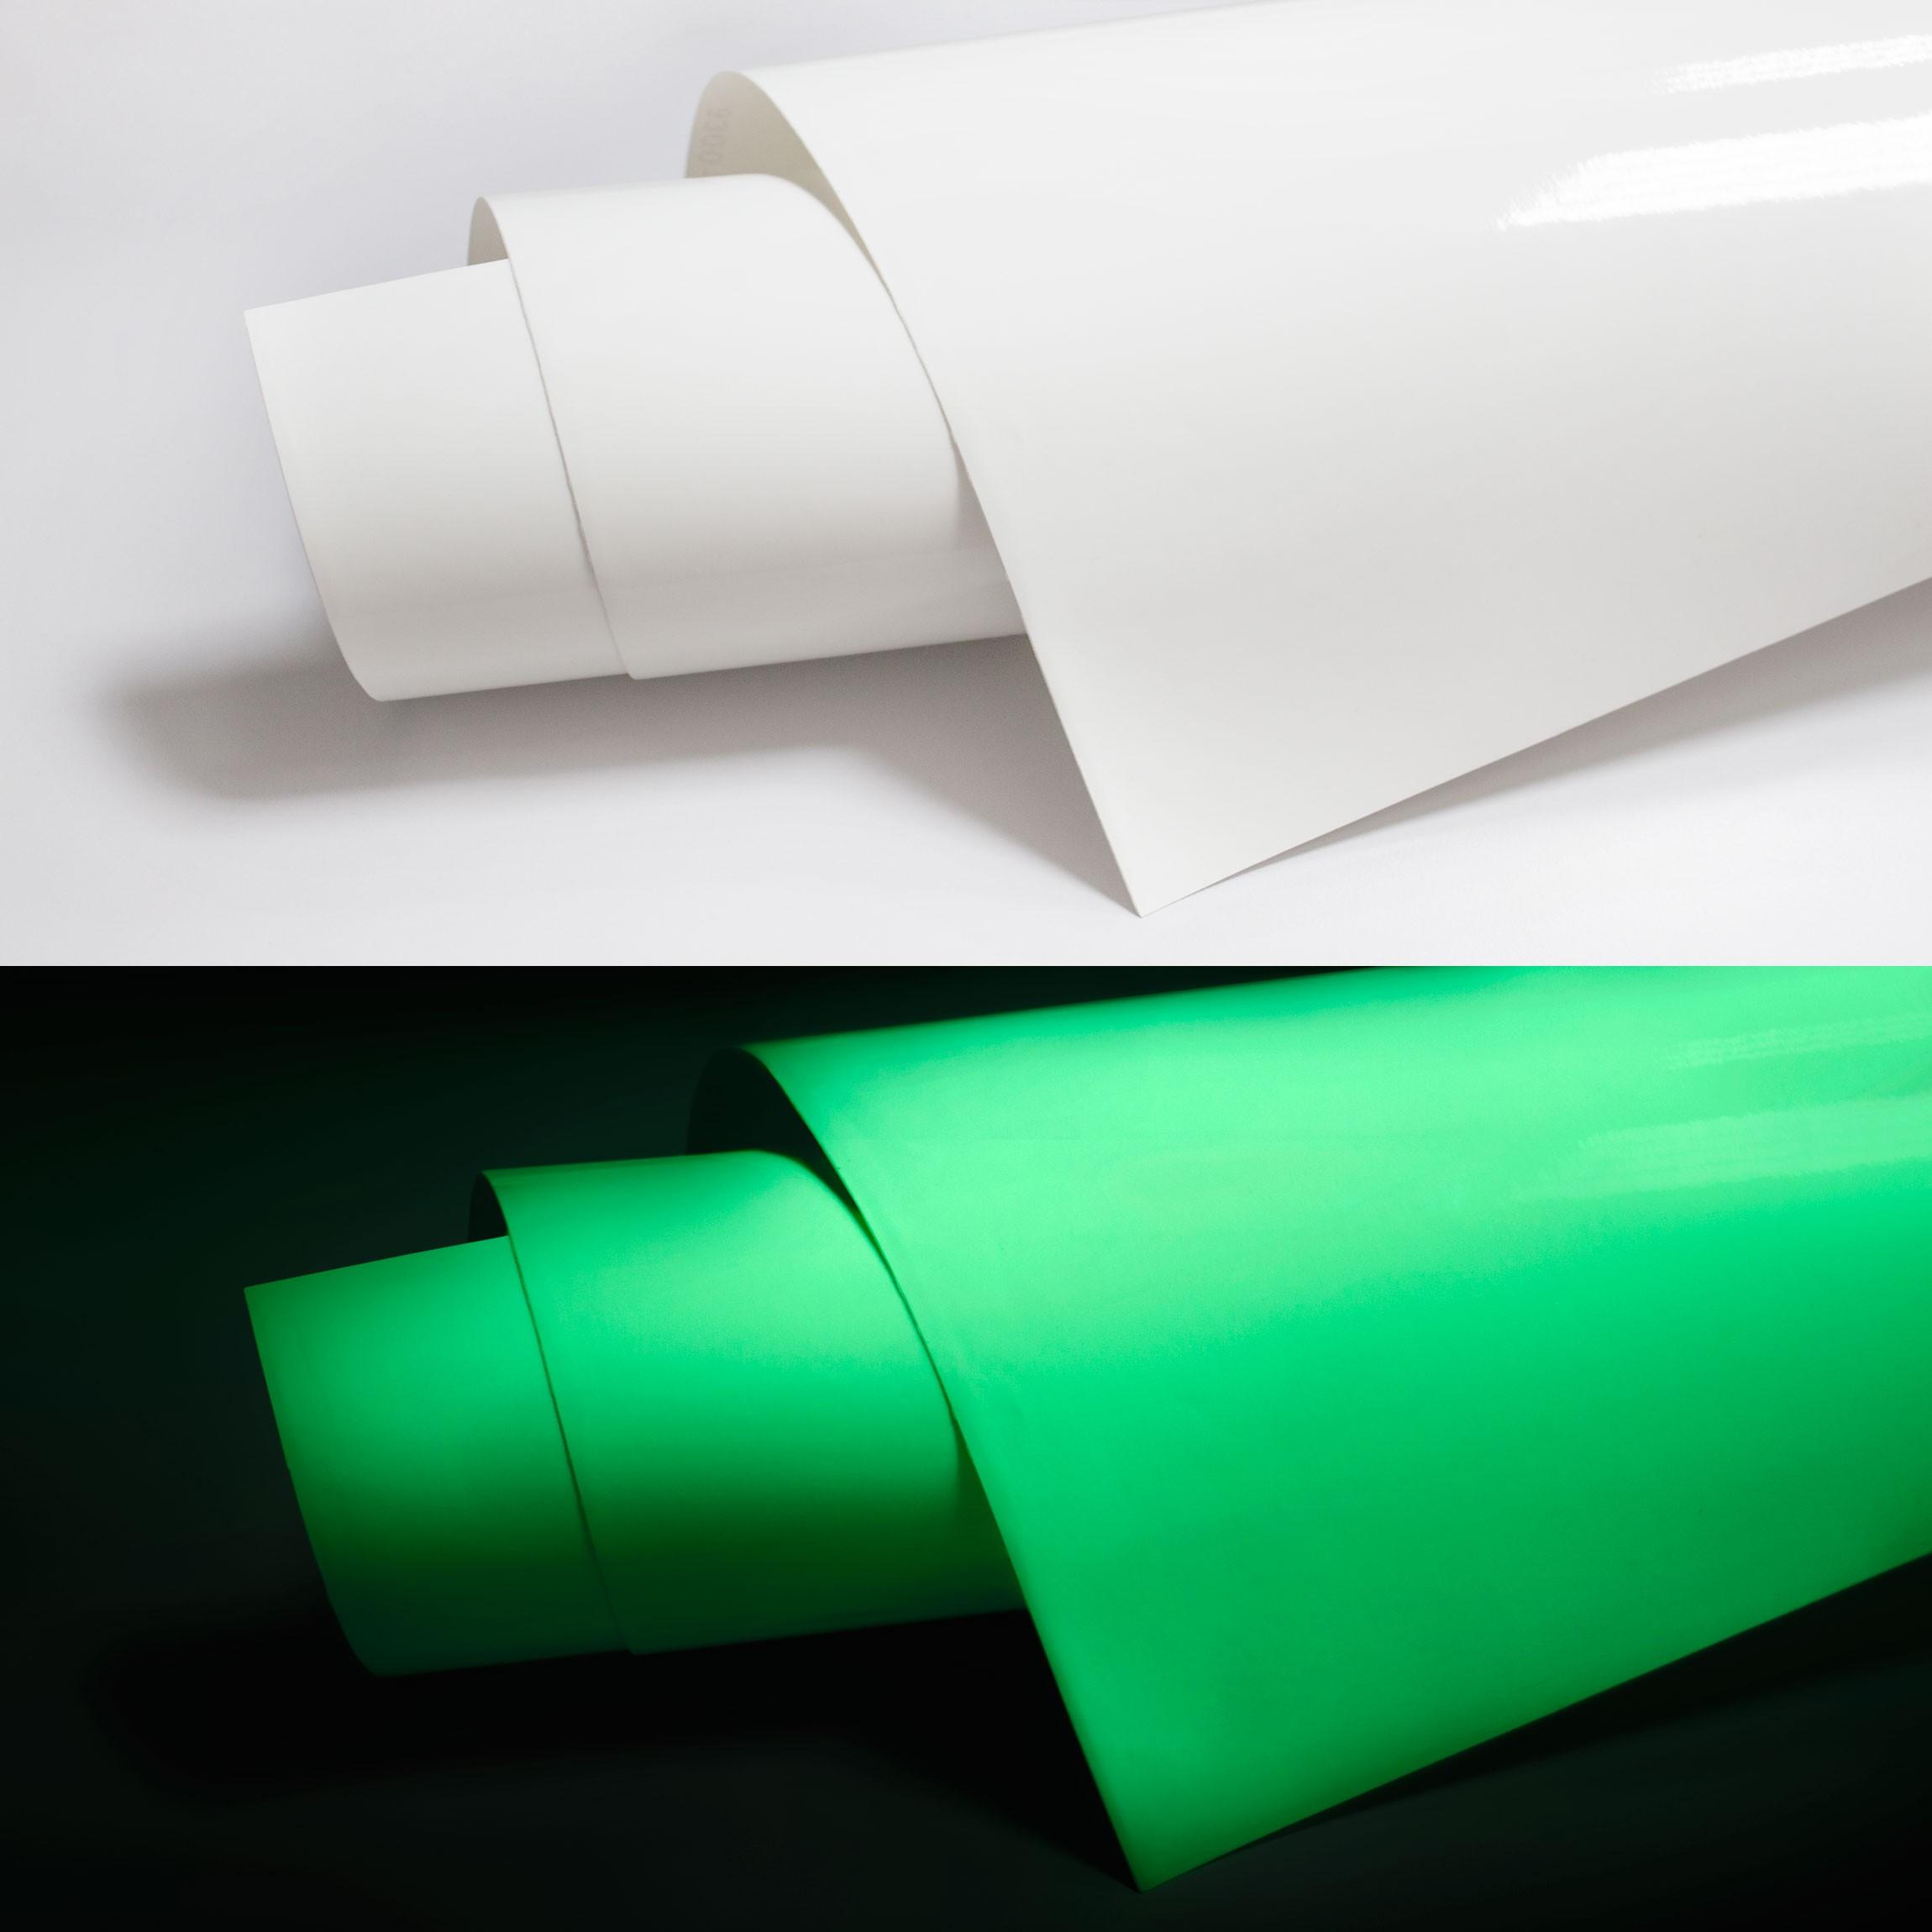 Selbstklebende folie leuchtfolie nachleuchtende for Selbstklebende folie kuchenwand